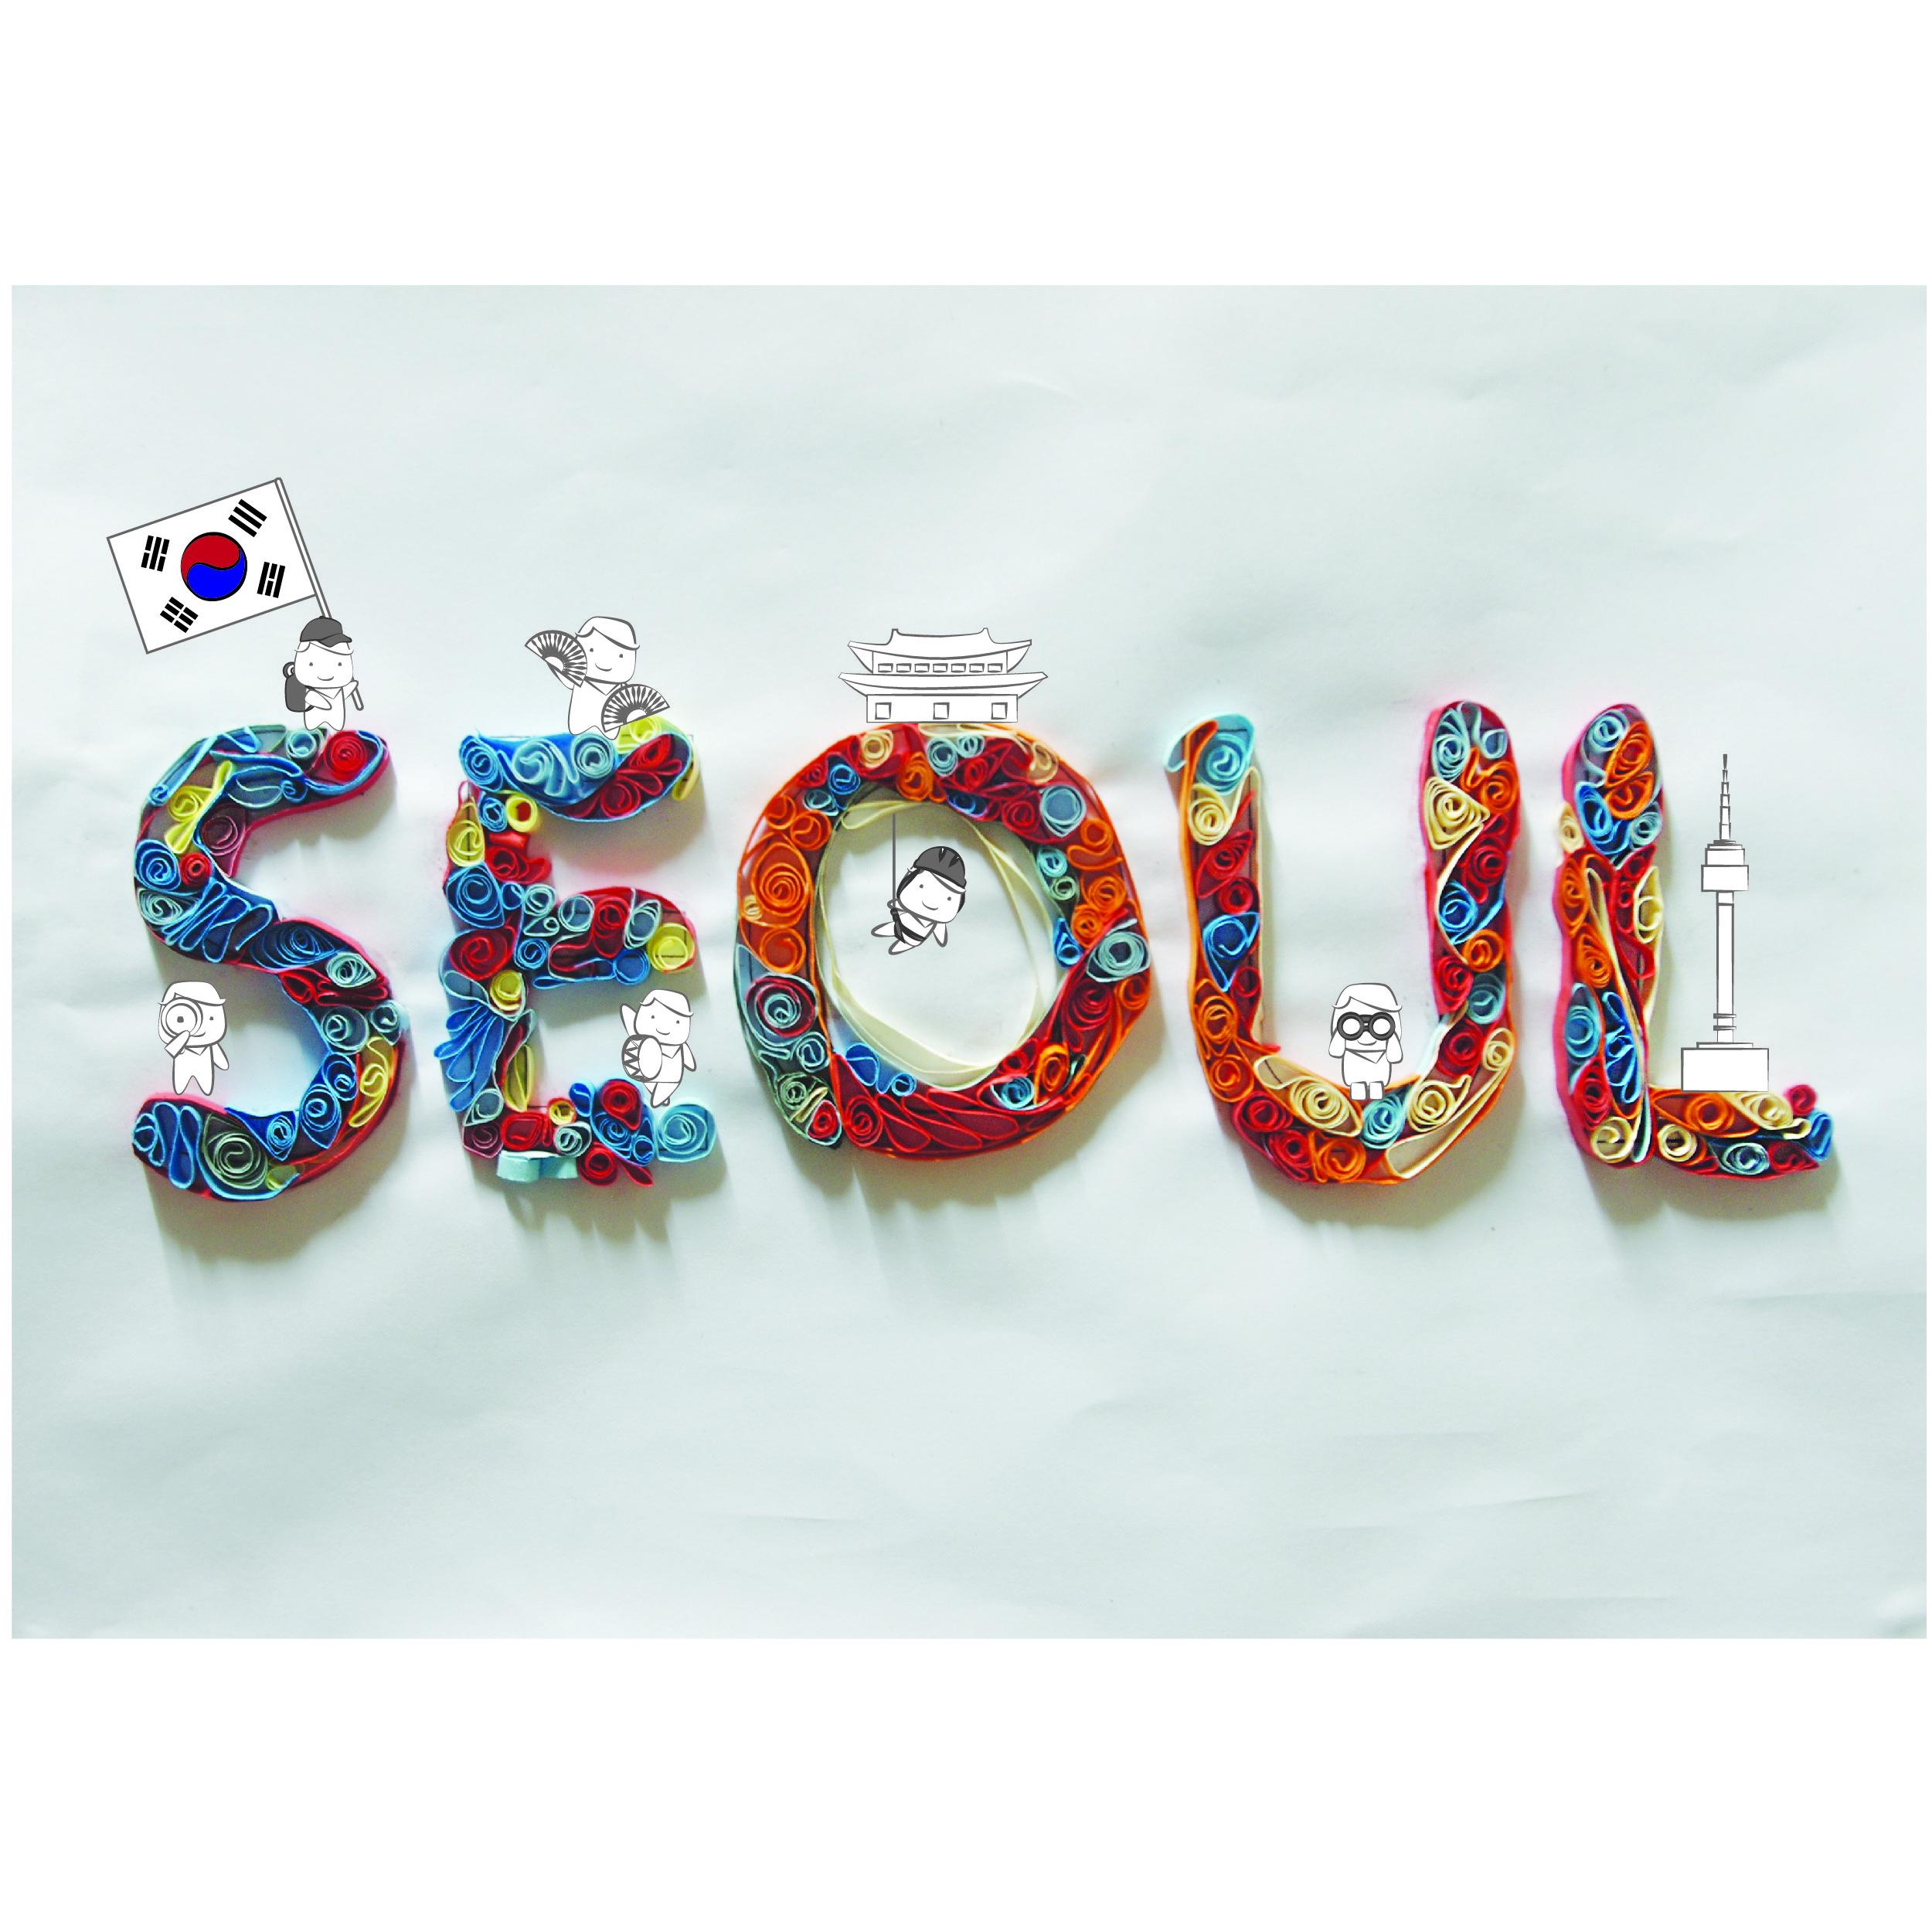 Seoul Typography Contest - zyin jeanne